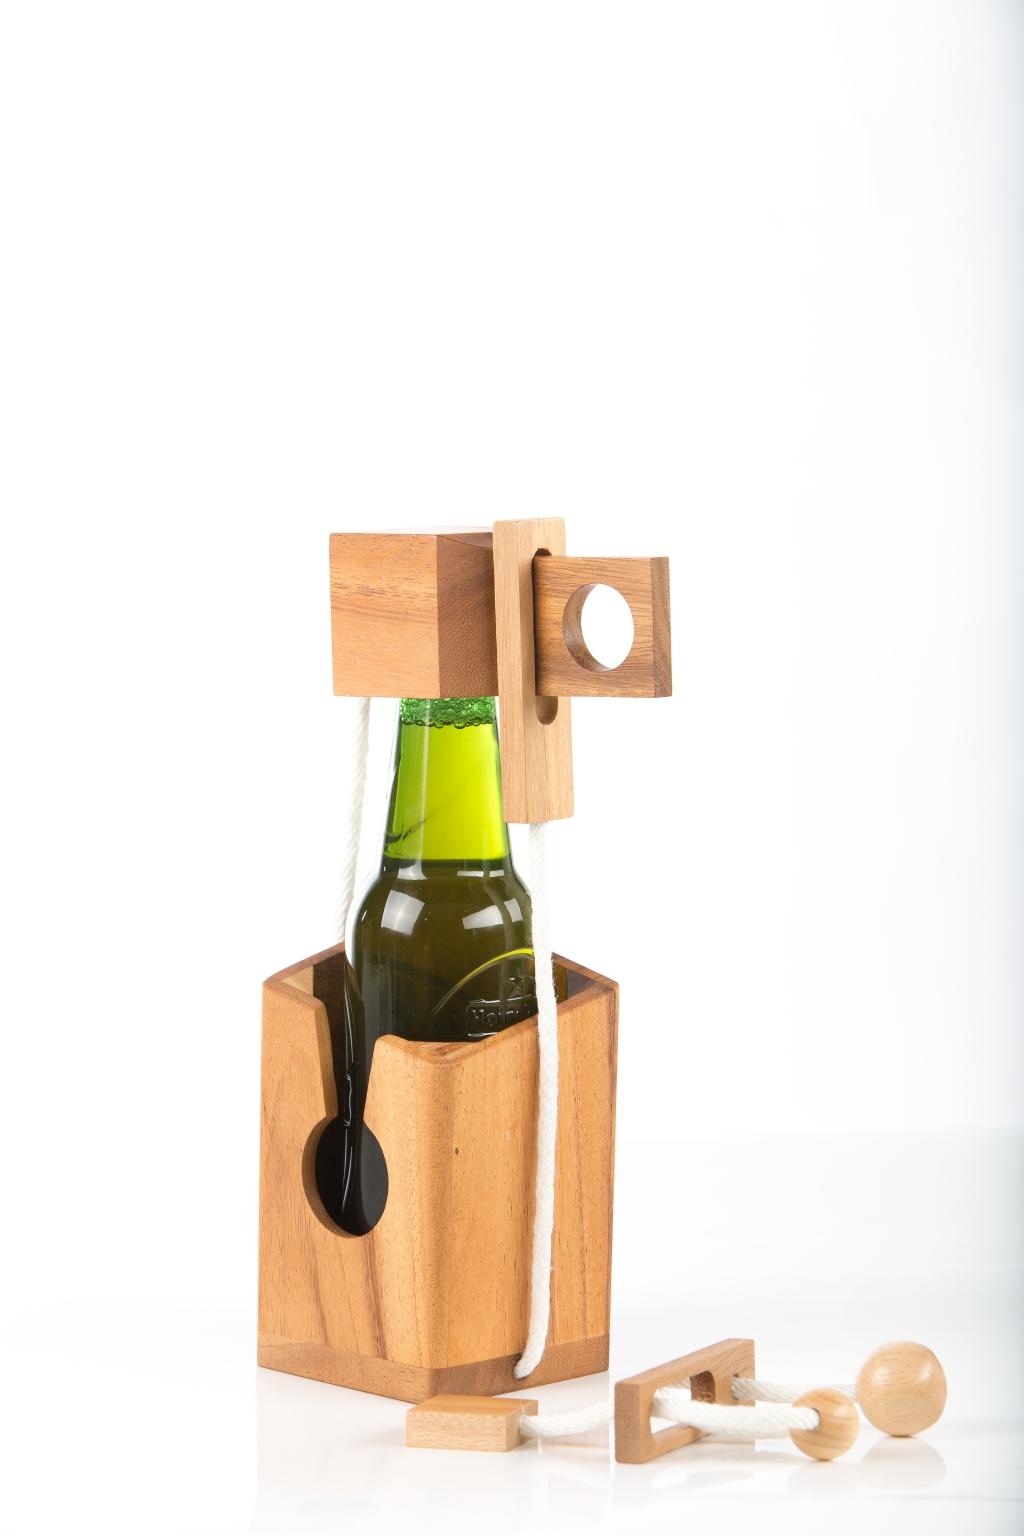 Get Drink 1 (Beer Size)